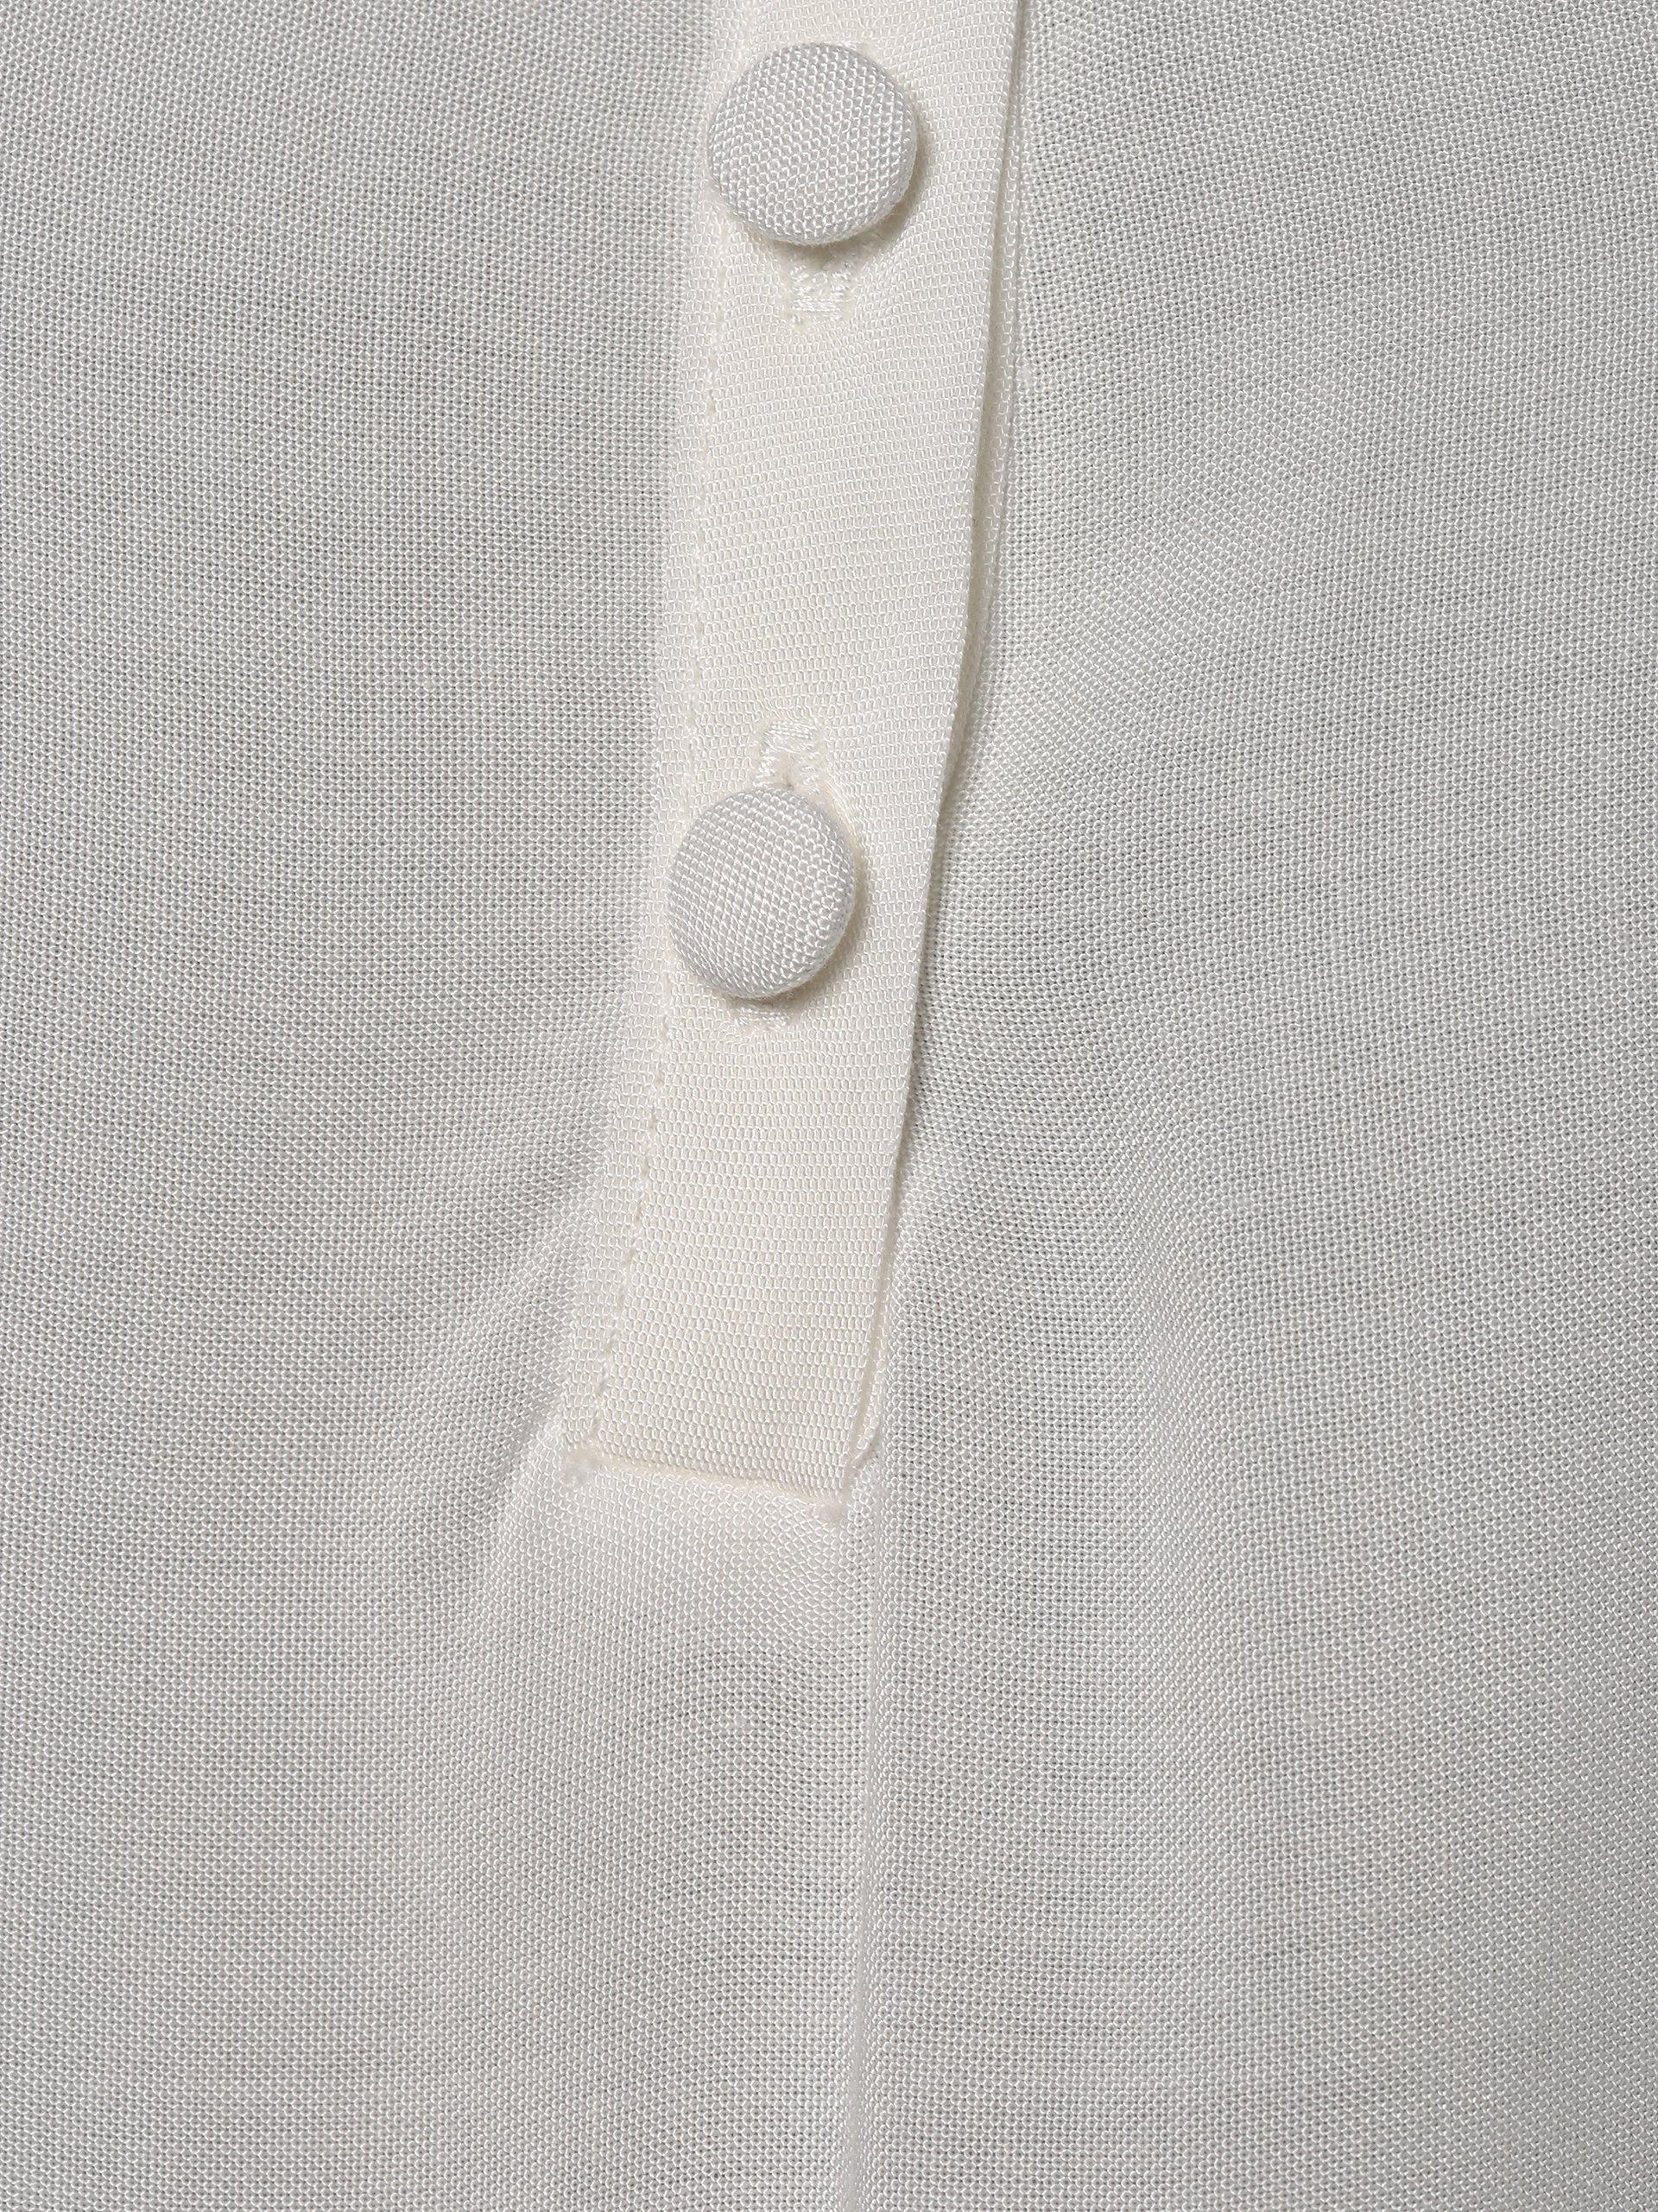 Vero Moda Damen Shirt - Vmnina